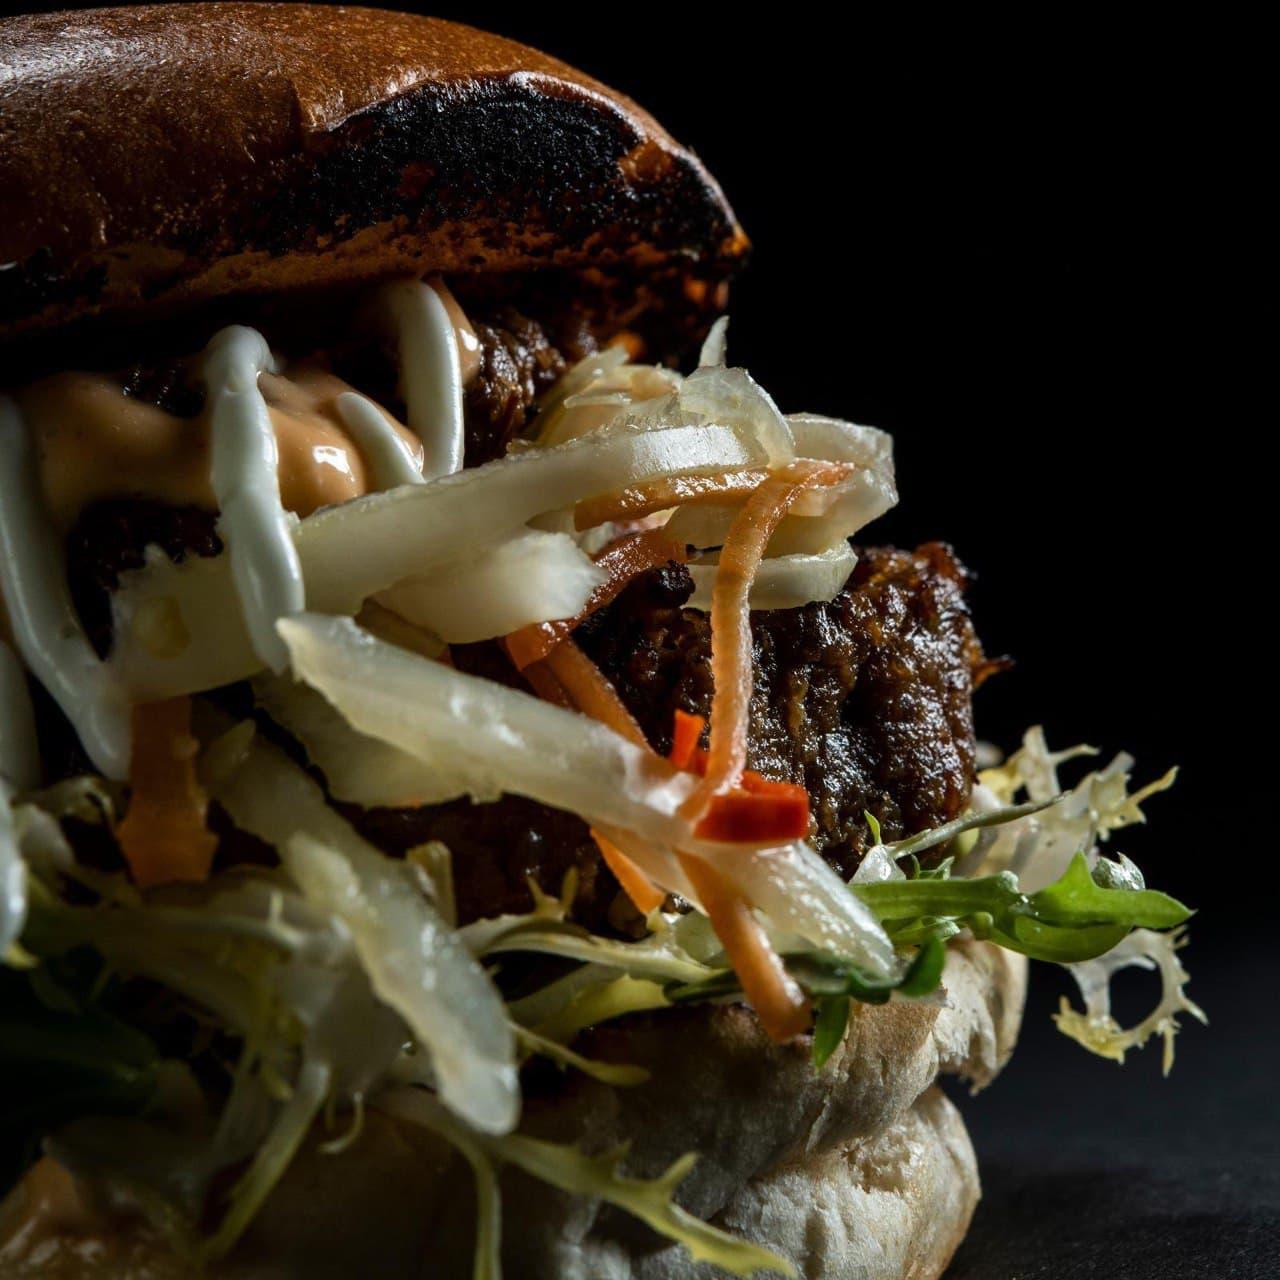 warung de rozario rendang burger